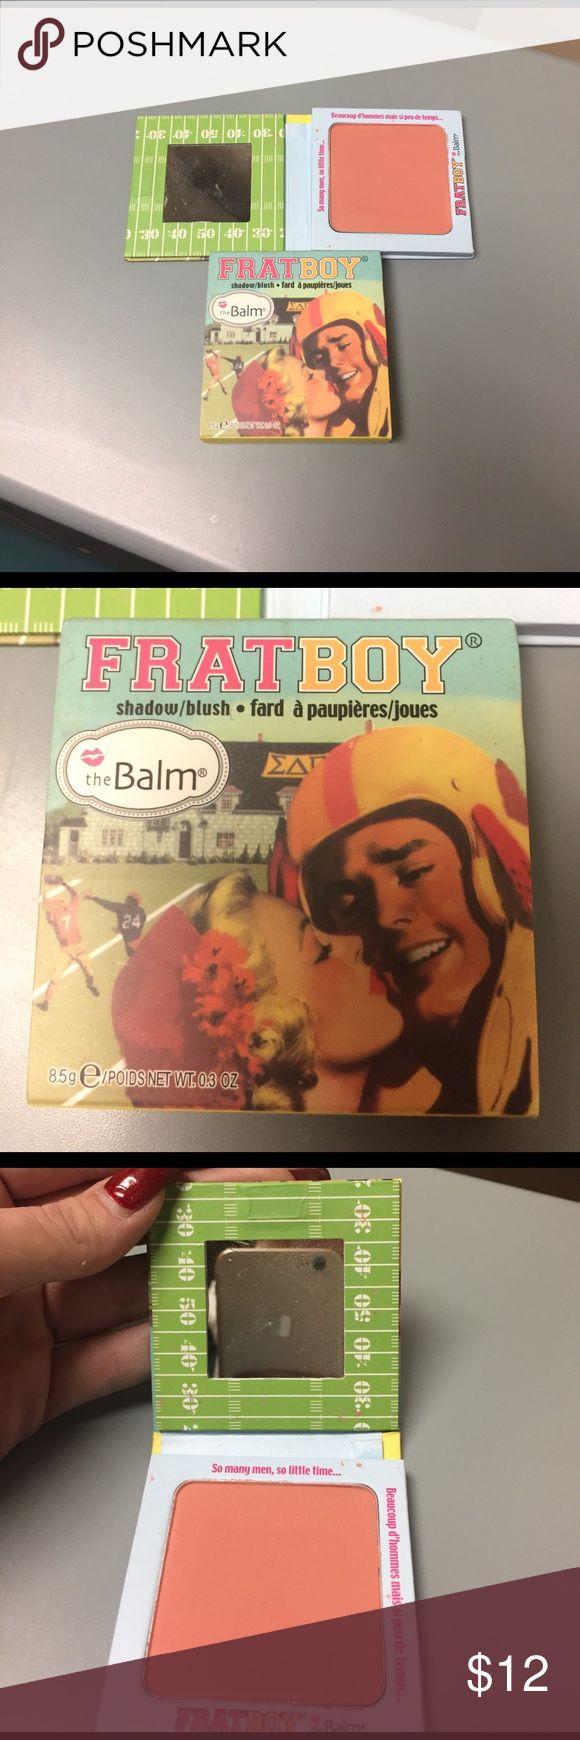 FRAT BOY BY THE BALM EYESHADOW AND BLUSH The balm brand blush, brand new. NEVER USED. the balm Makeup Blush